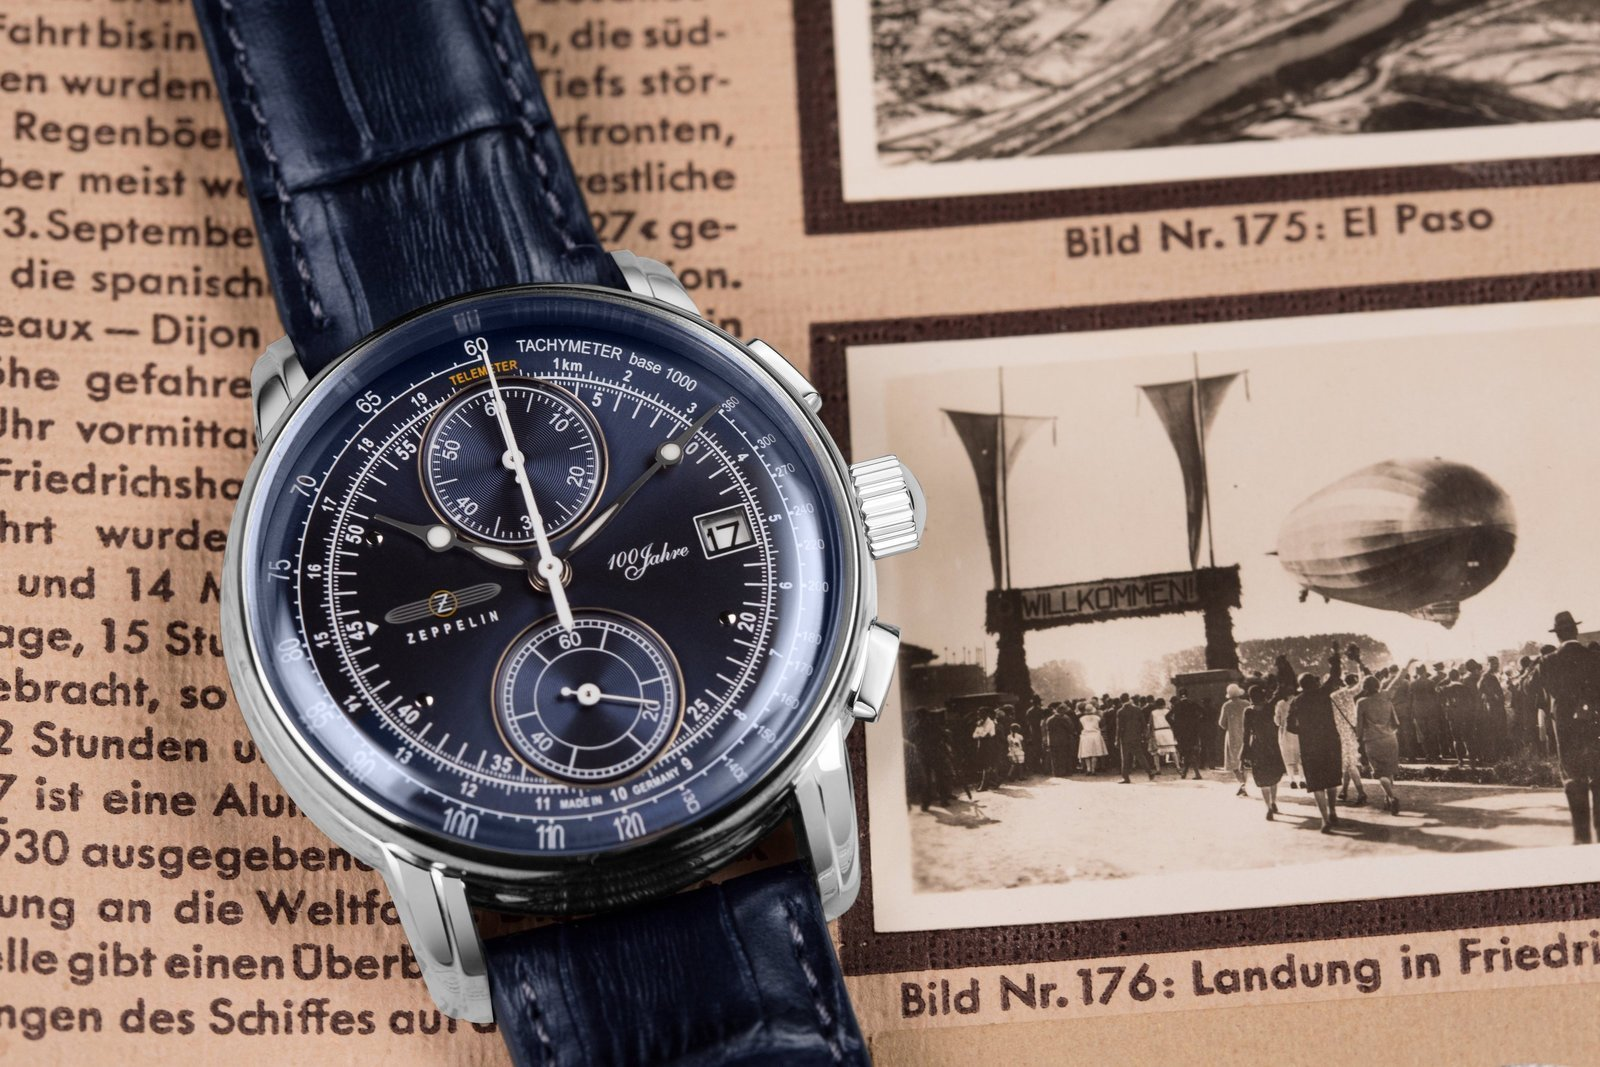 Часы Zeppelin 100 Years Zeppelin ED. 1 86703 синие